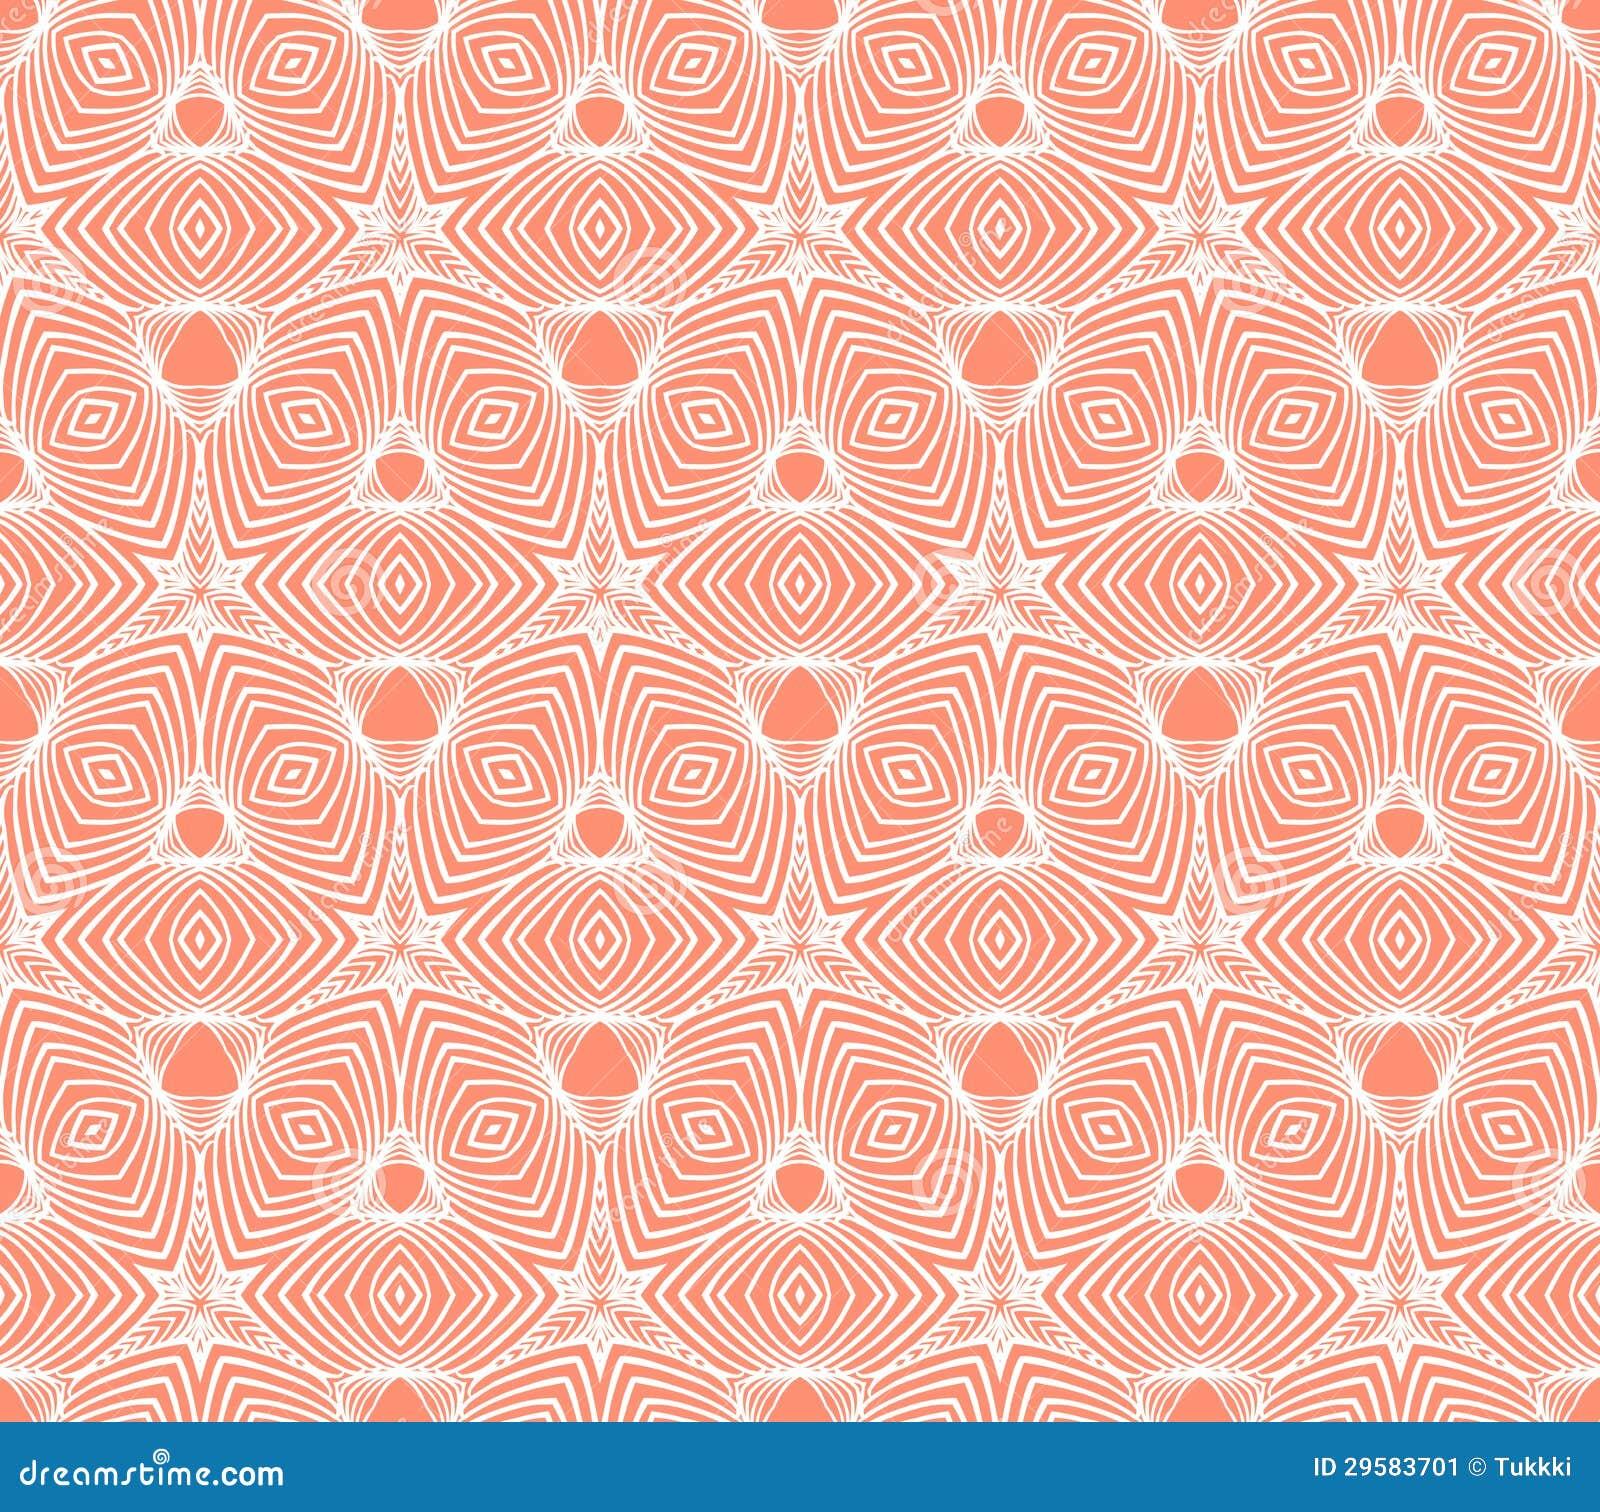 Linear Geometric Pattern 50s Wallpaper Design Stock Vector